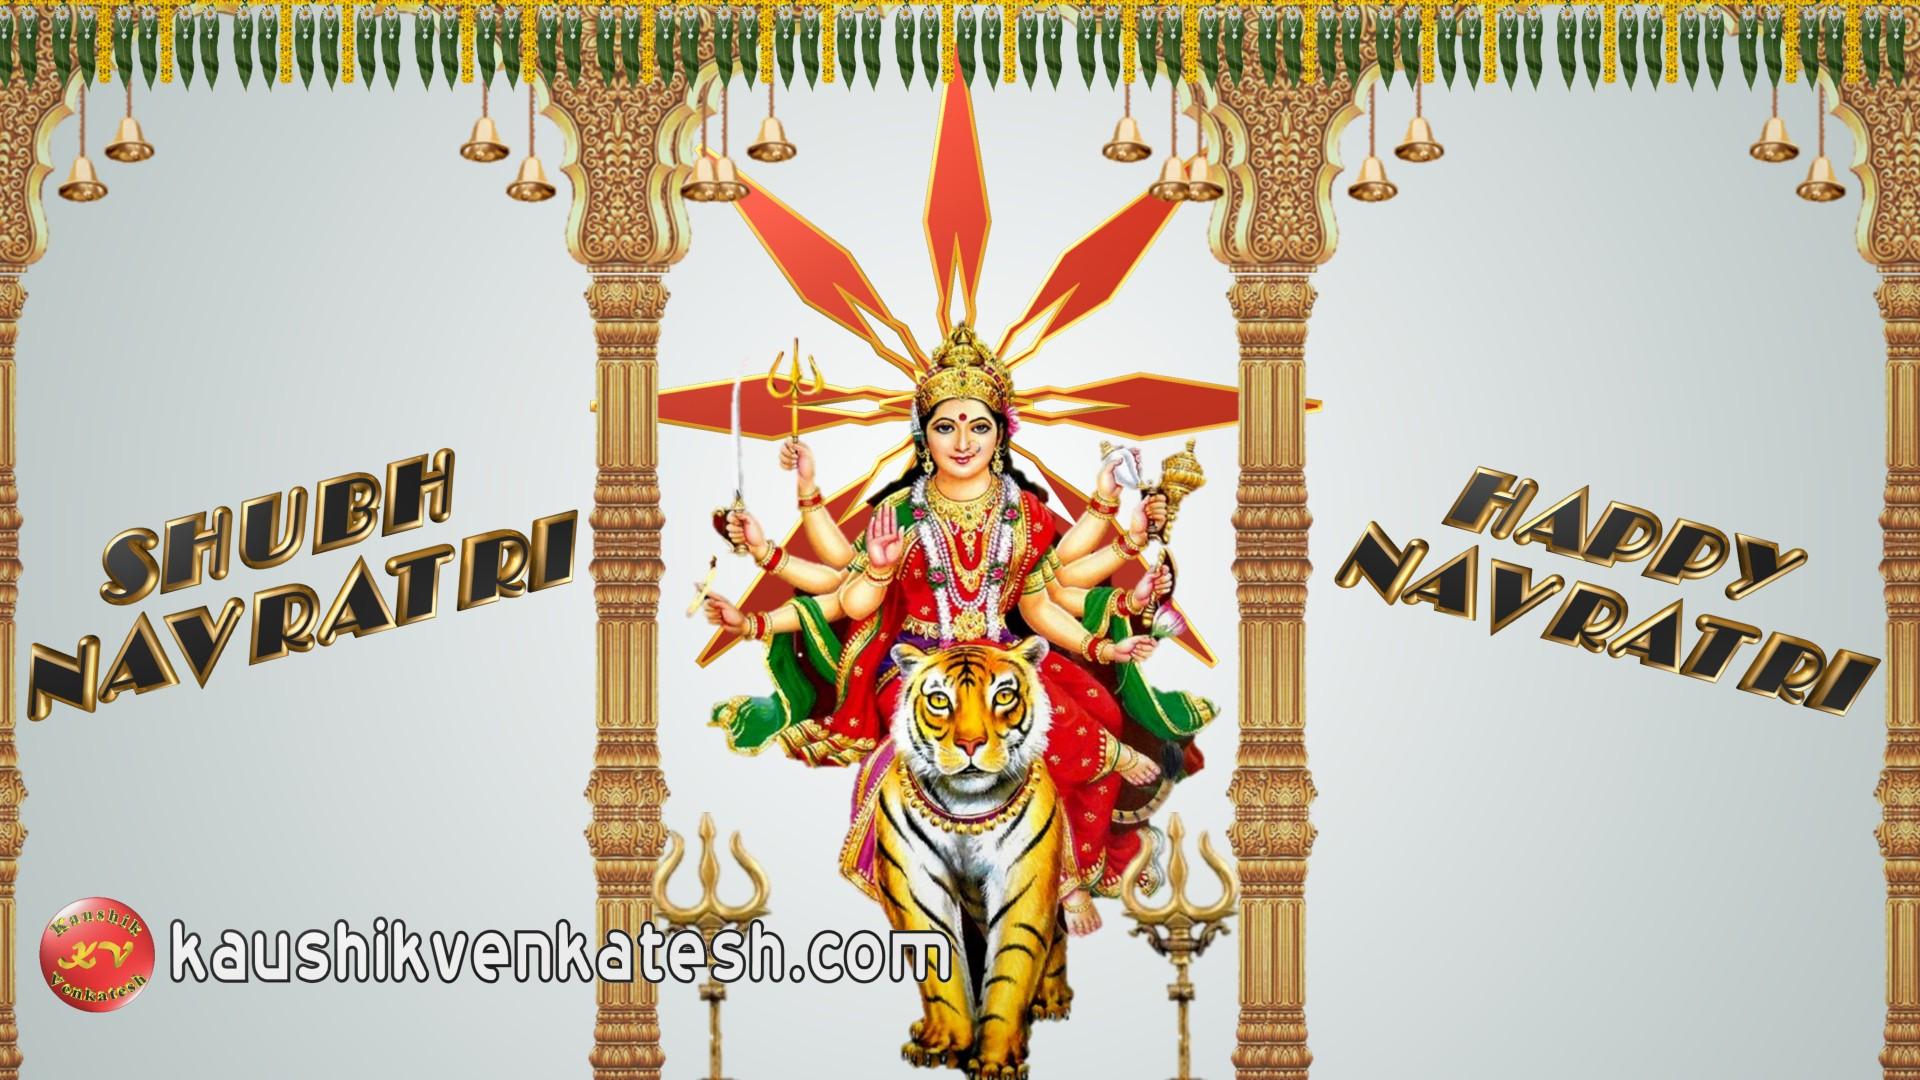 Greetings for the festival of Navratri